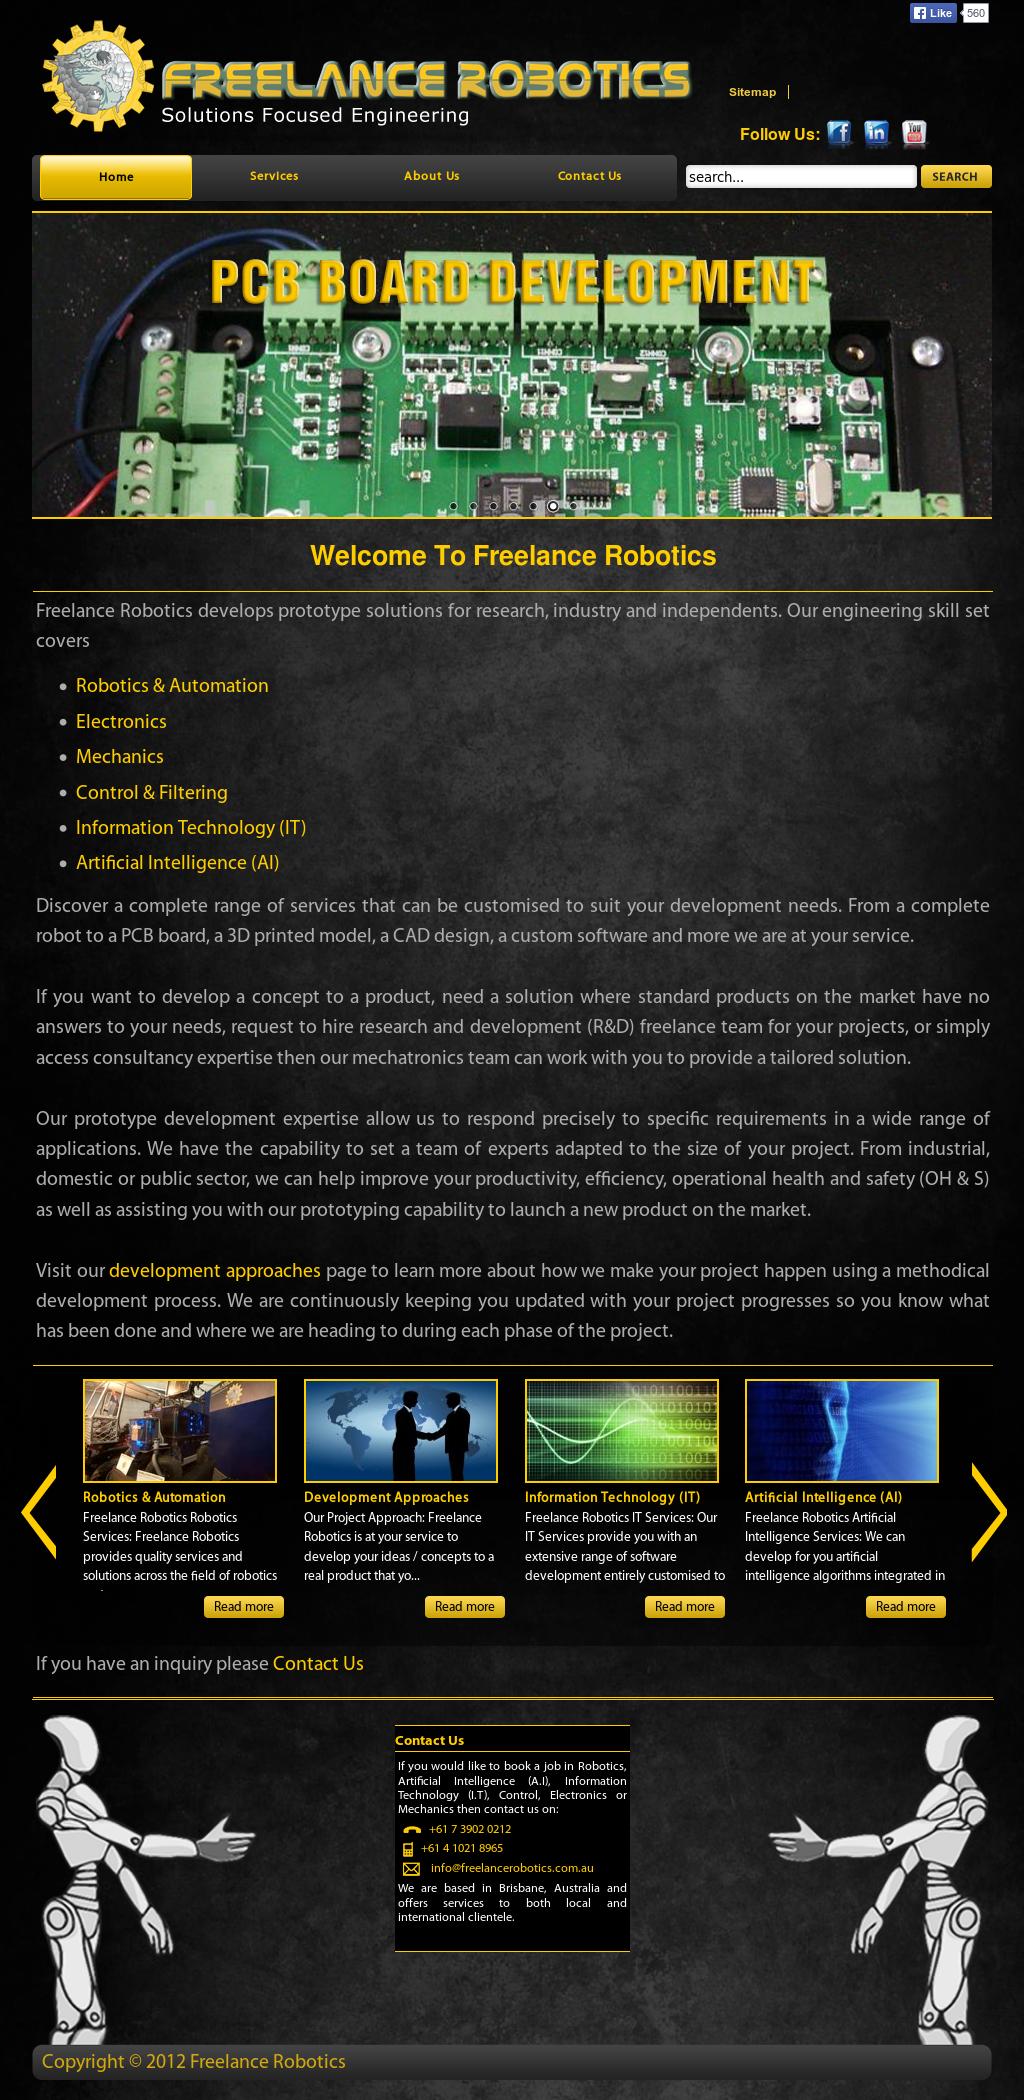 Freelance Robotics Competitors, Revenue and Employees - Owler